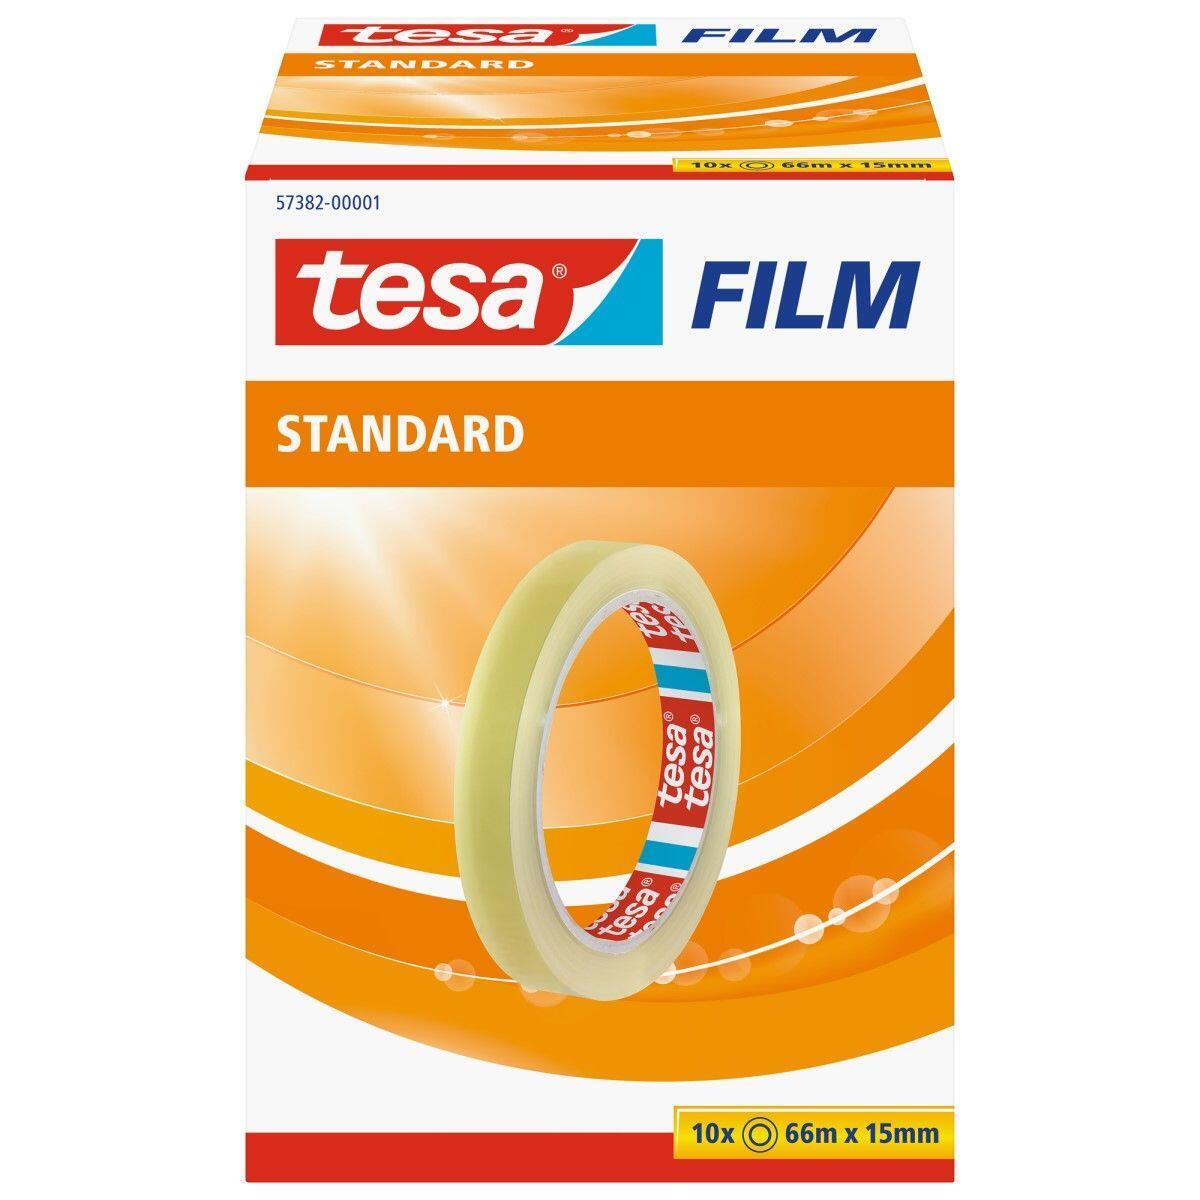 Nastro adesivo TESA tesafilm 15 mm x 66 m trasparente - 5